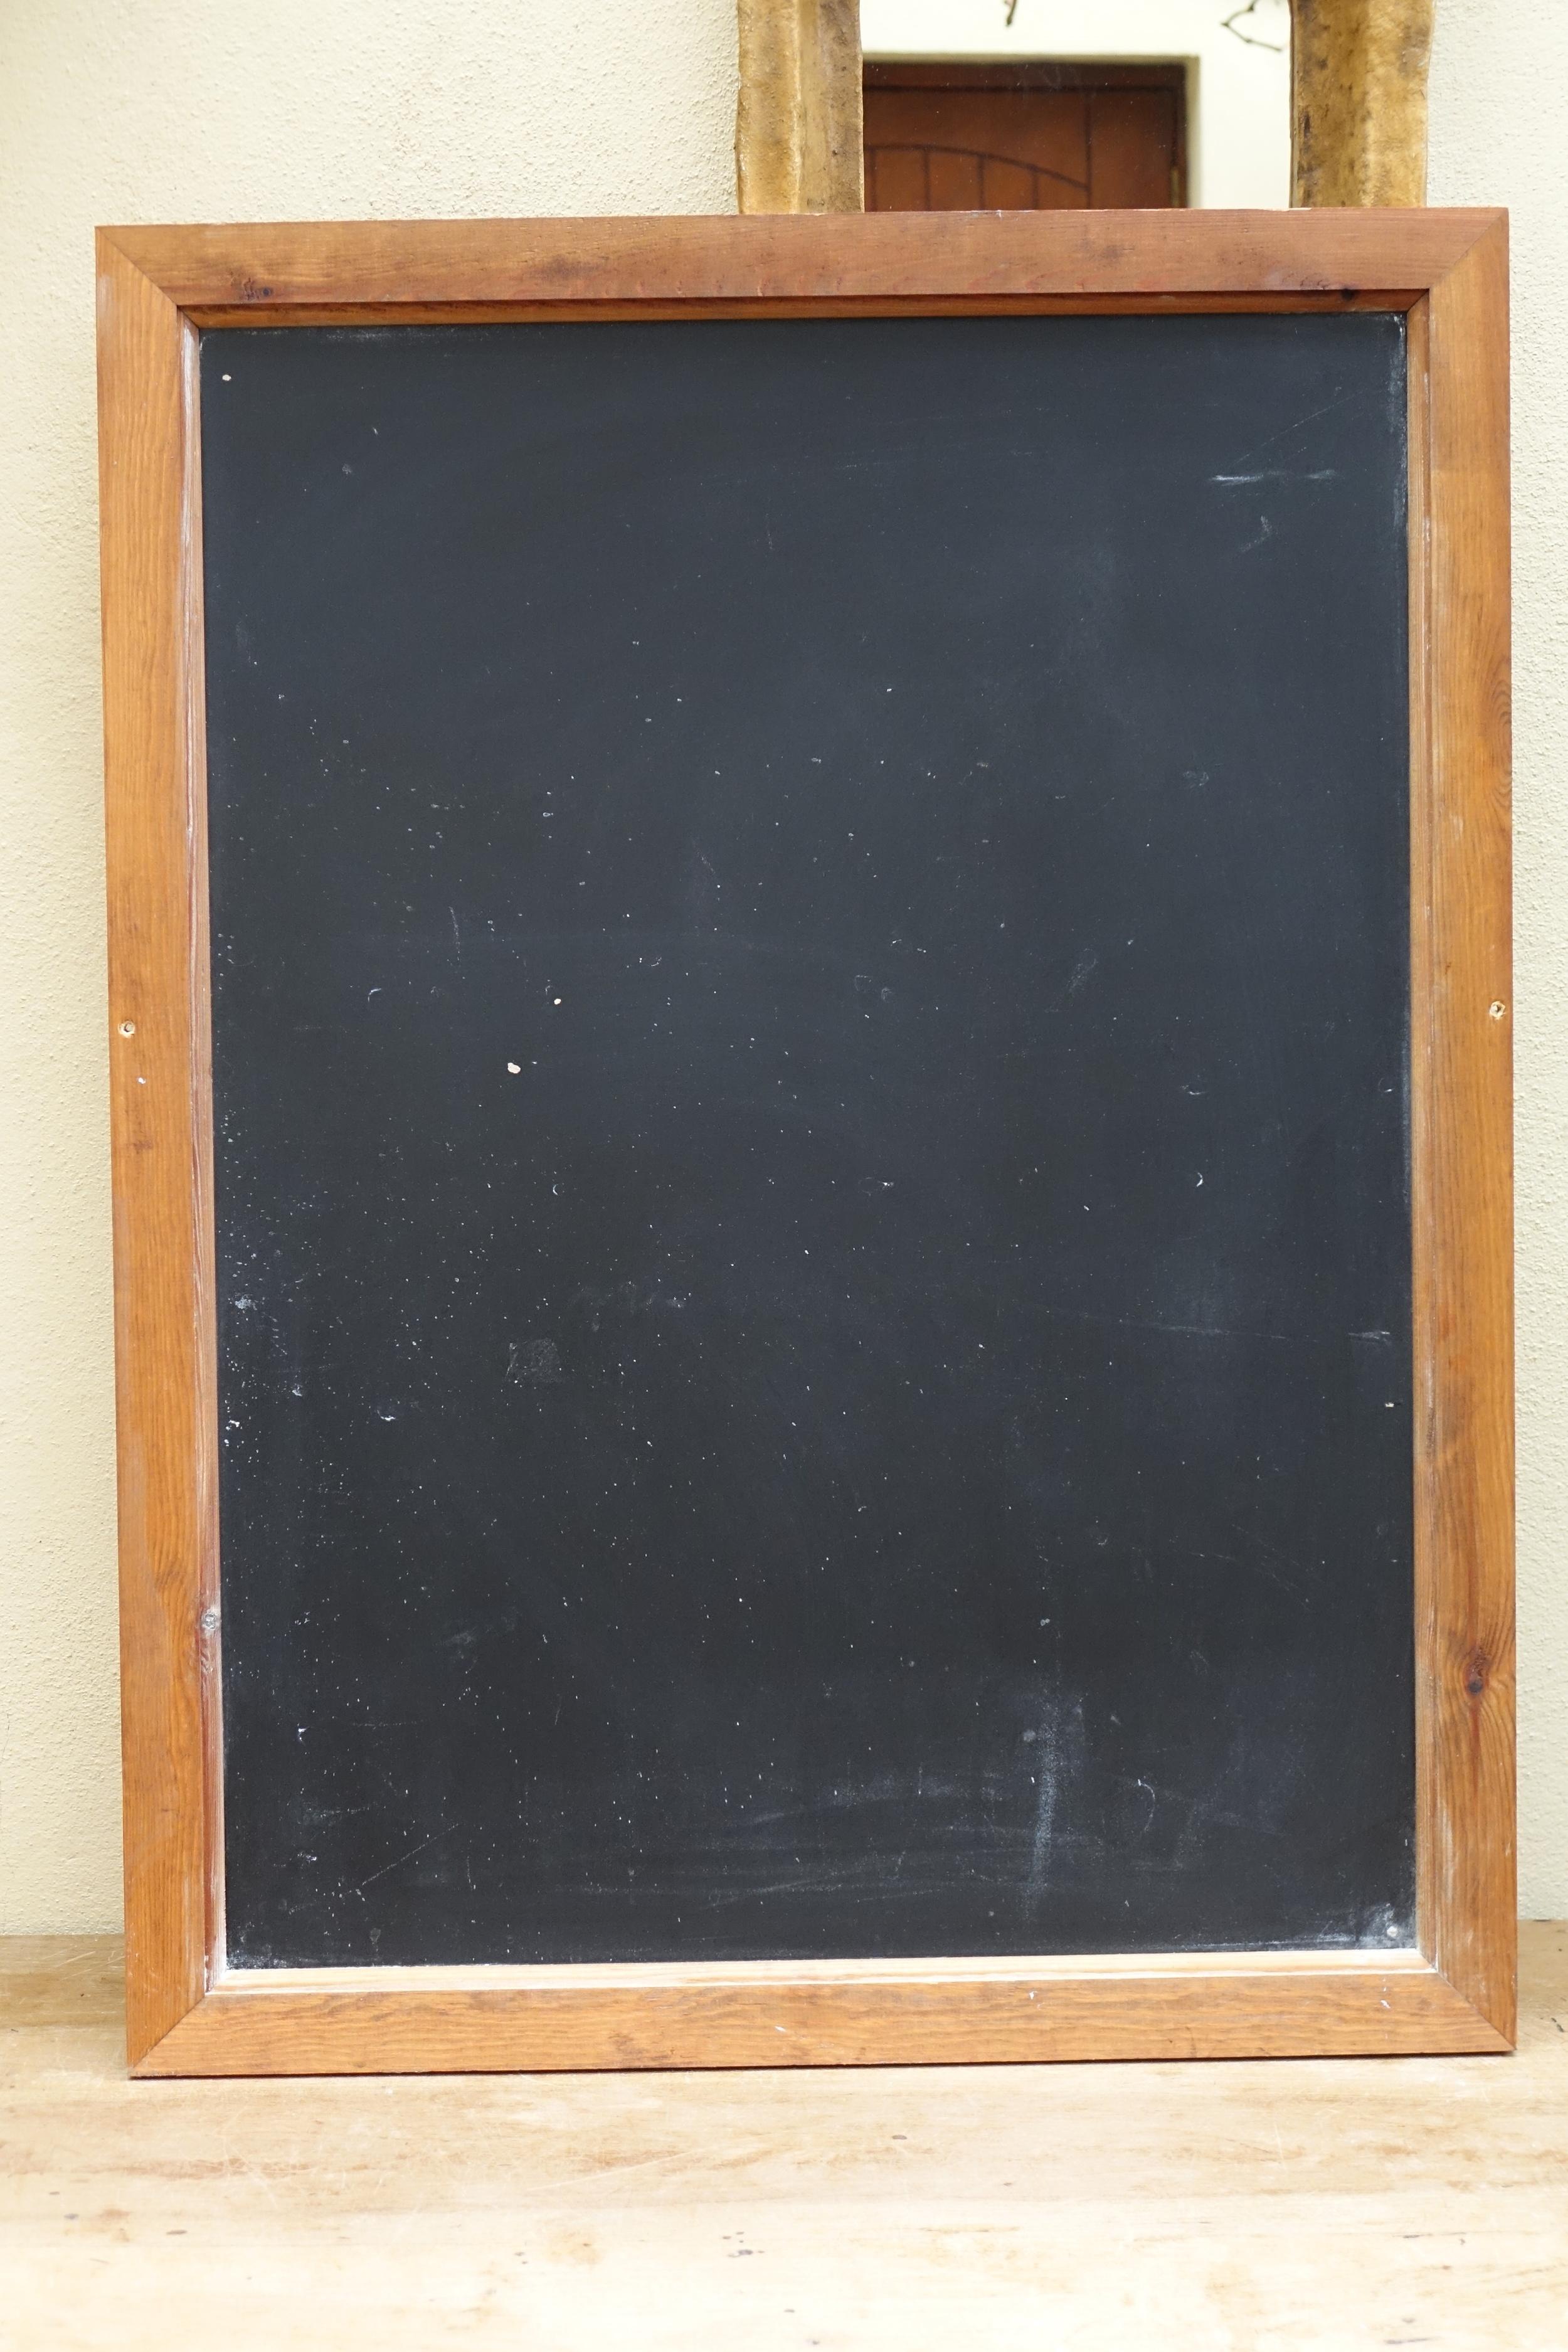 Large blackboard - £8